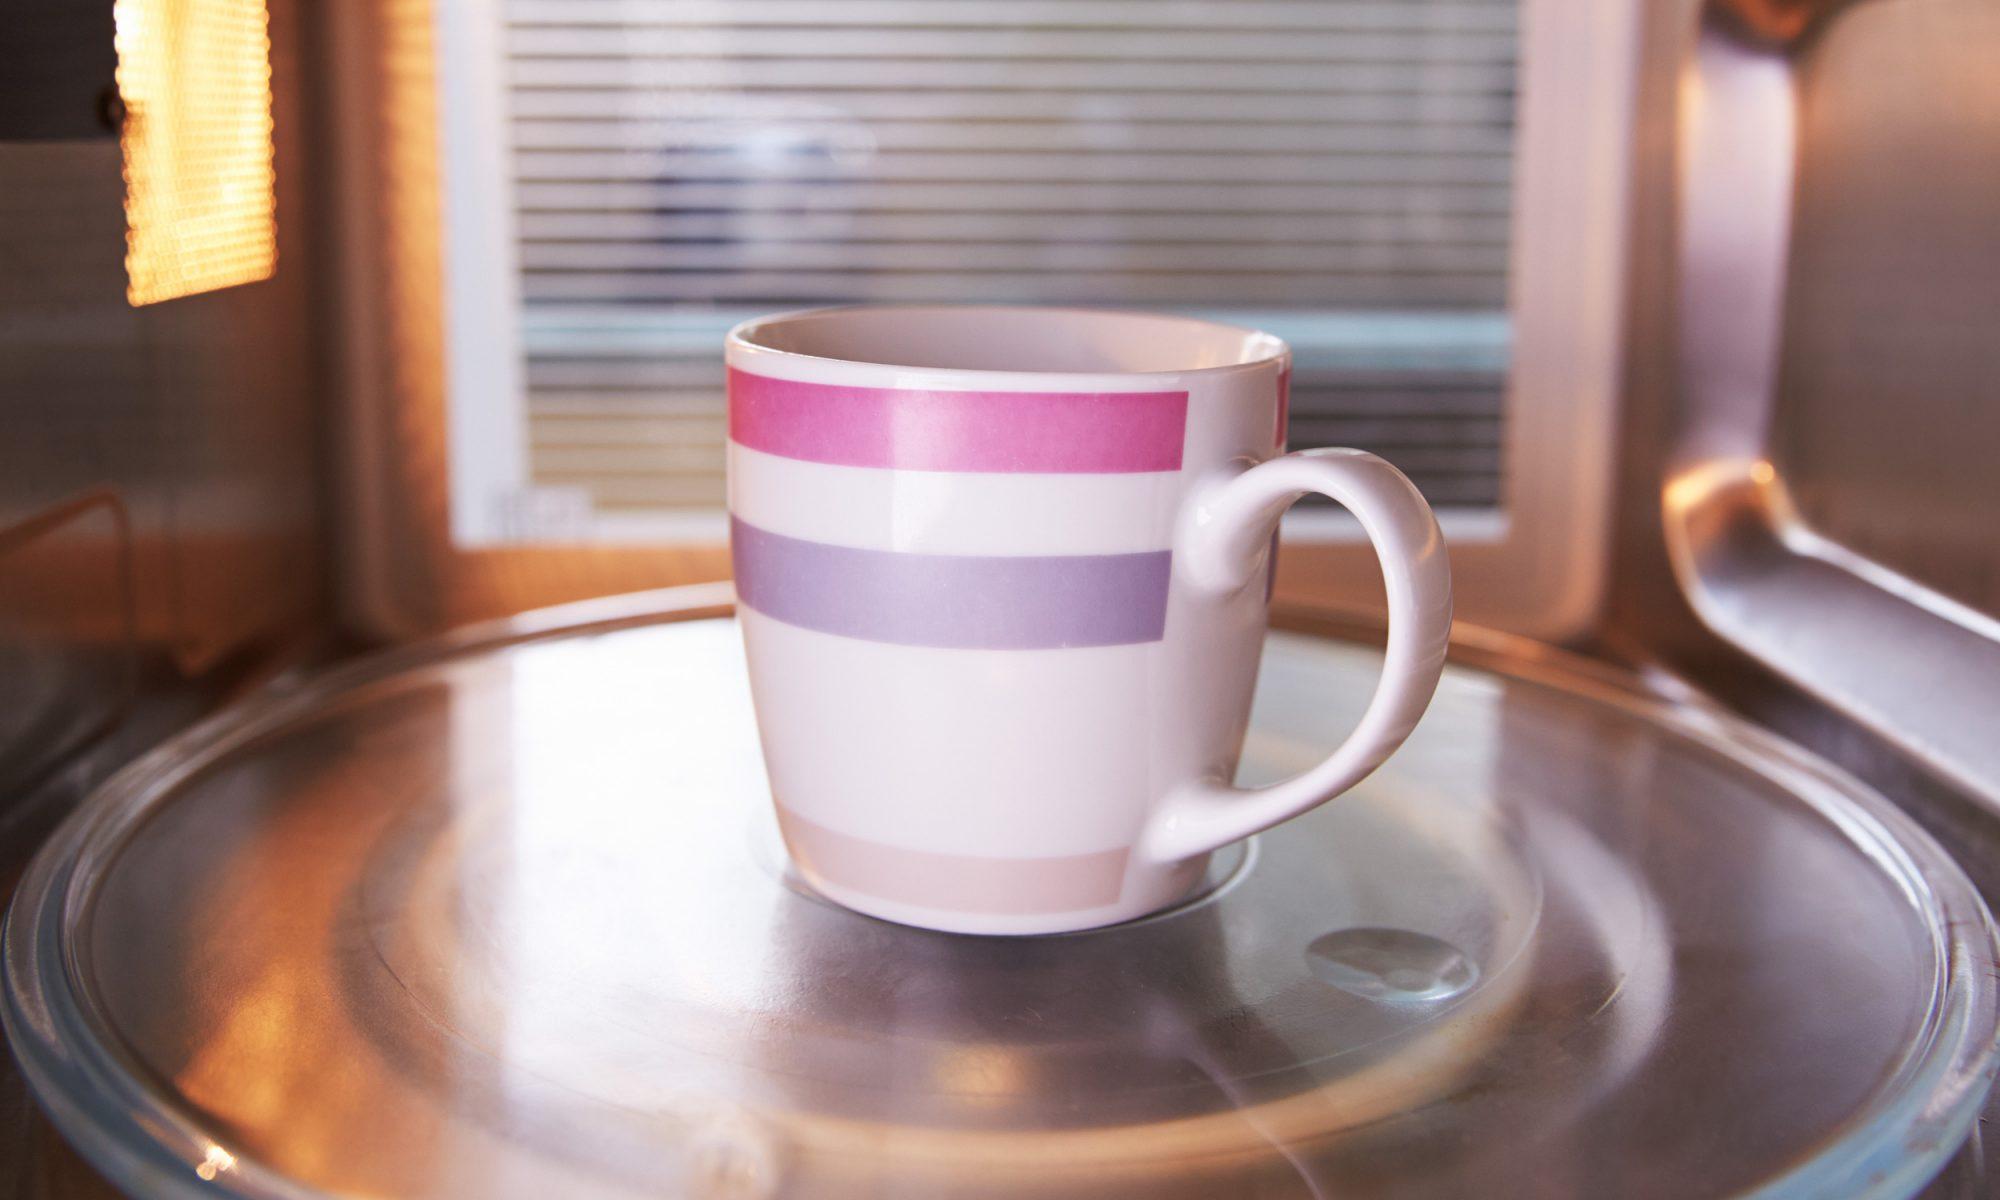 EC: Microwaving Your Tea Makes It Healthier